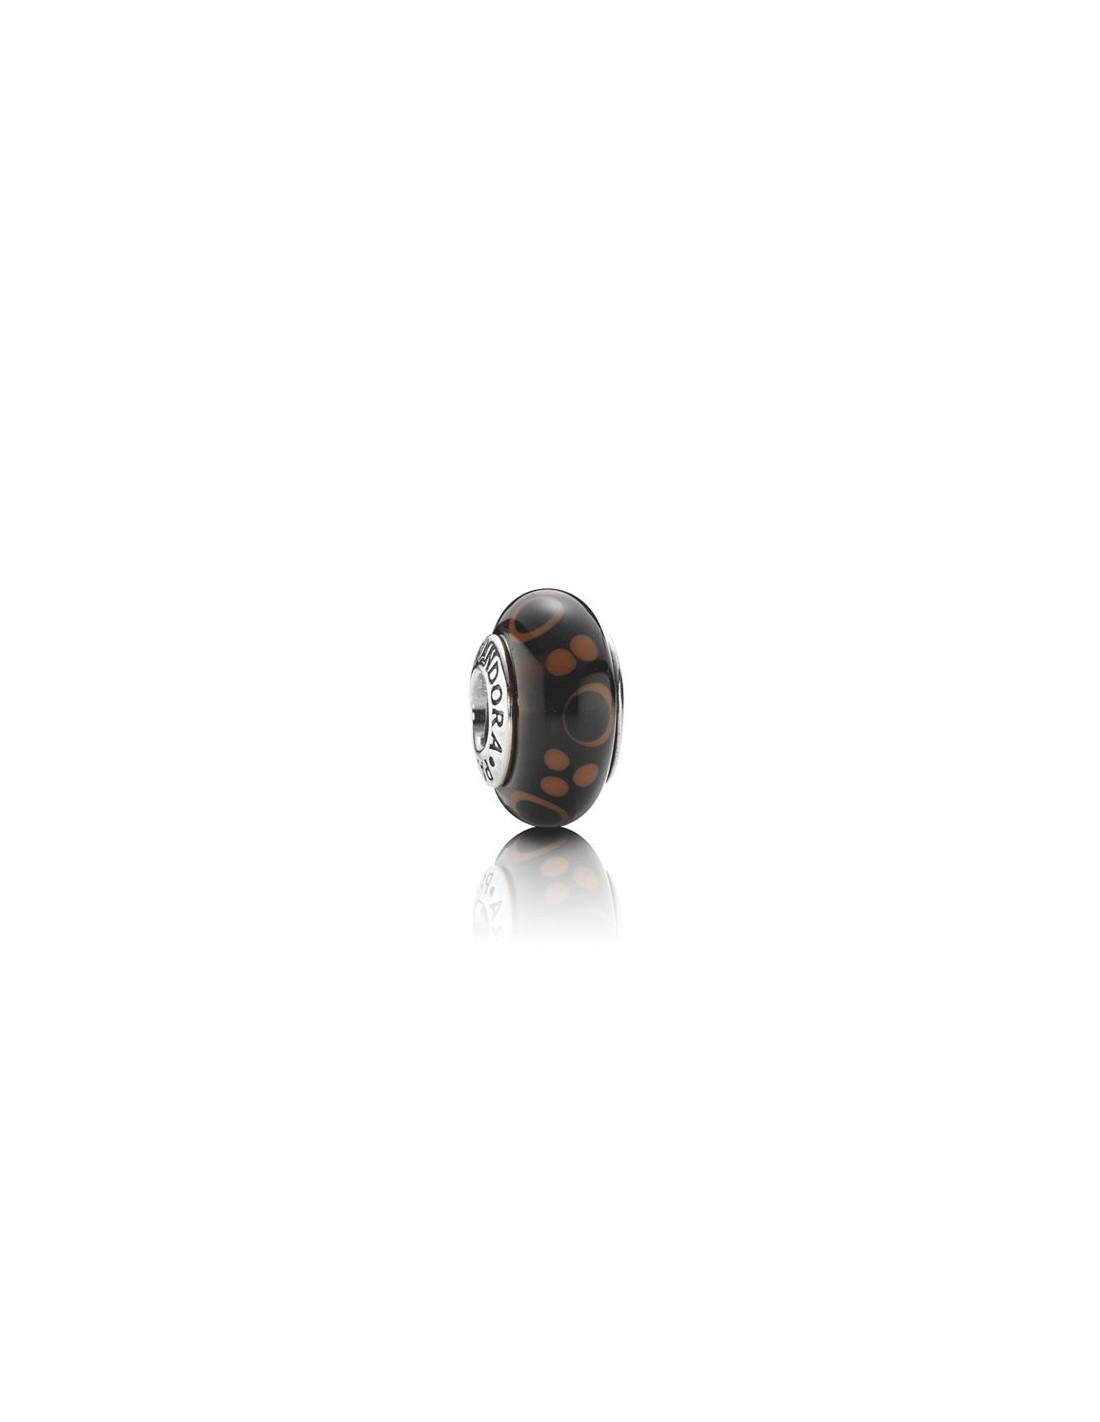 abalorios pandora murano